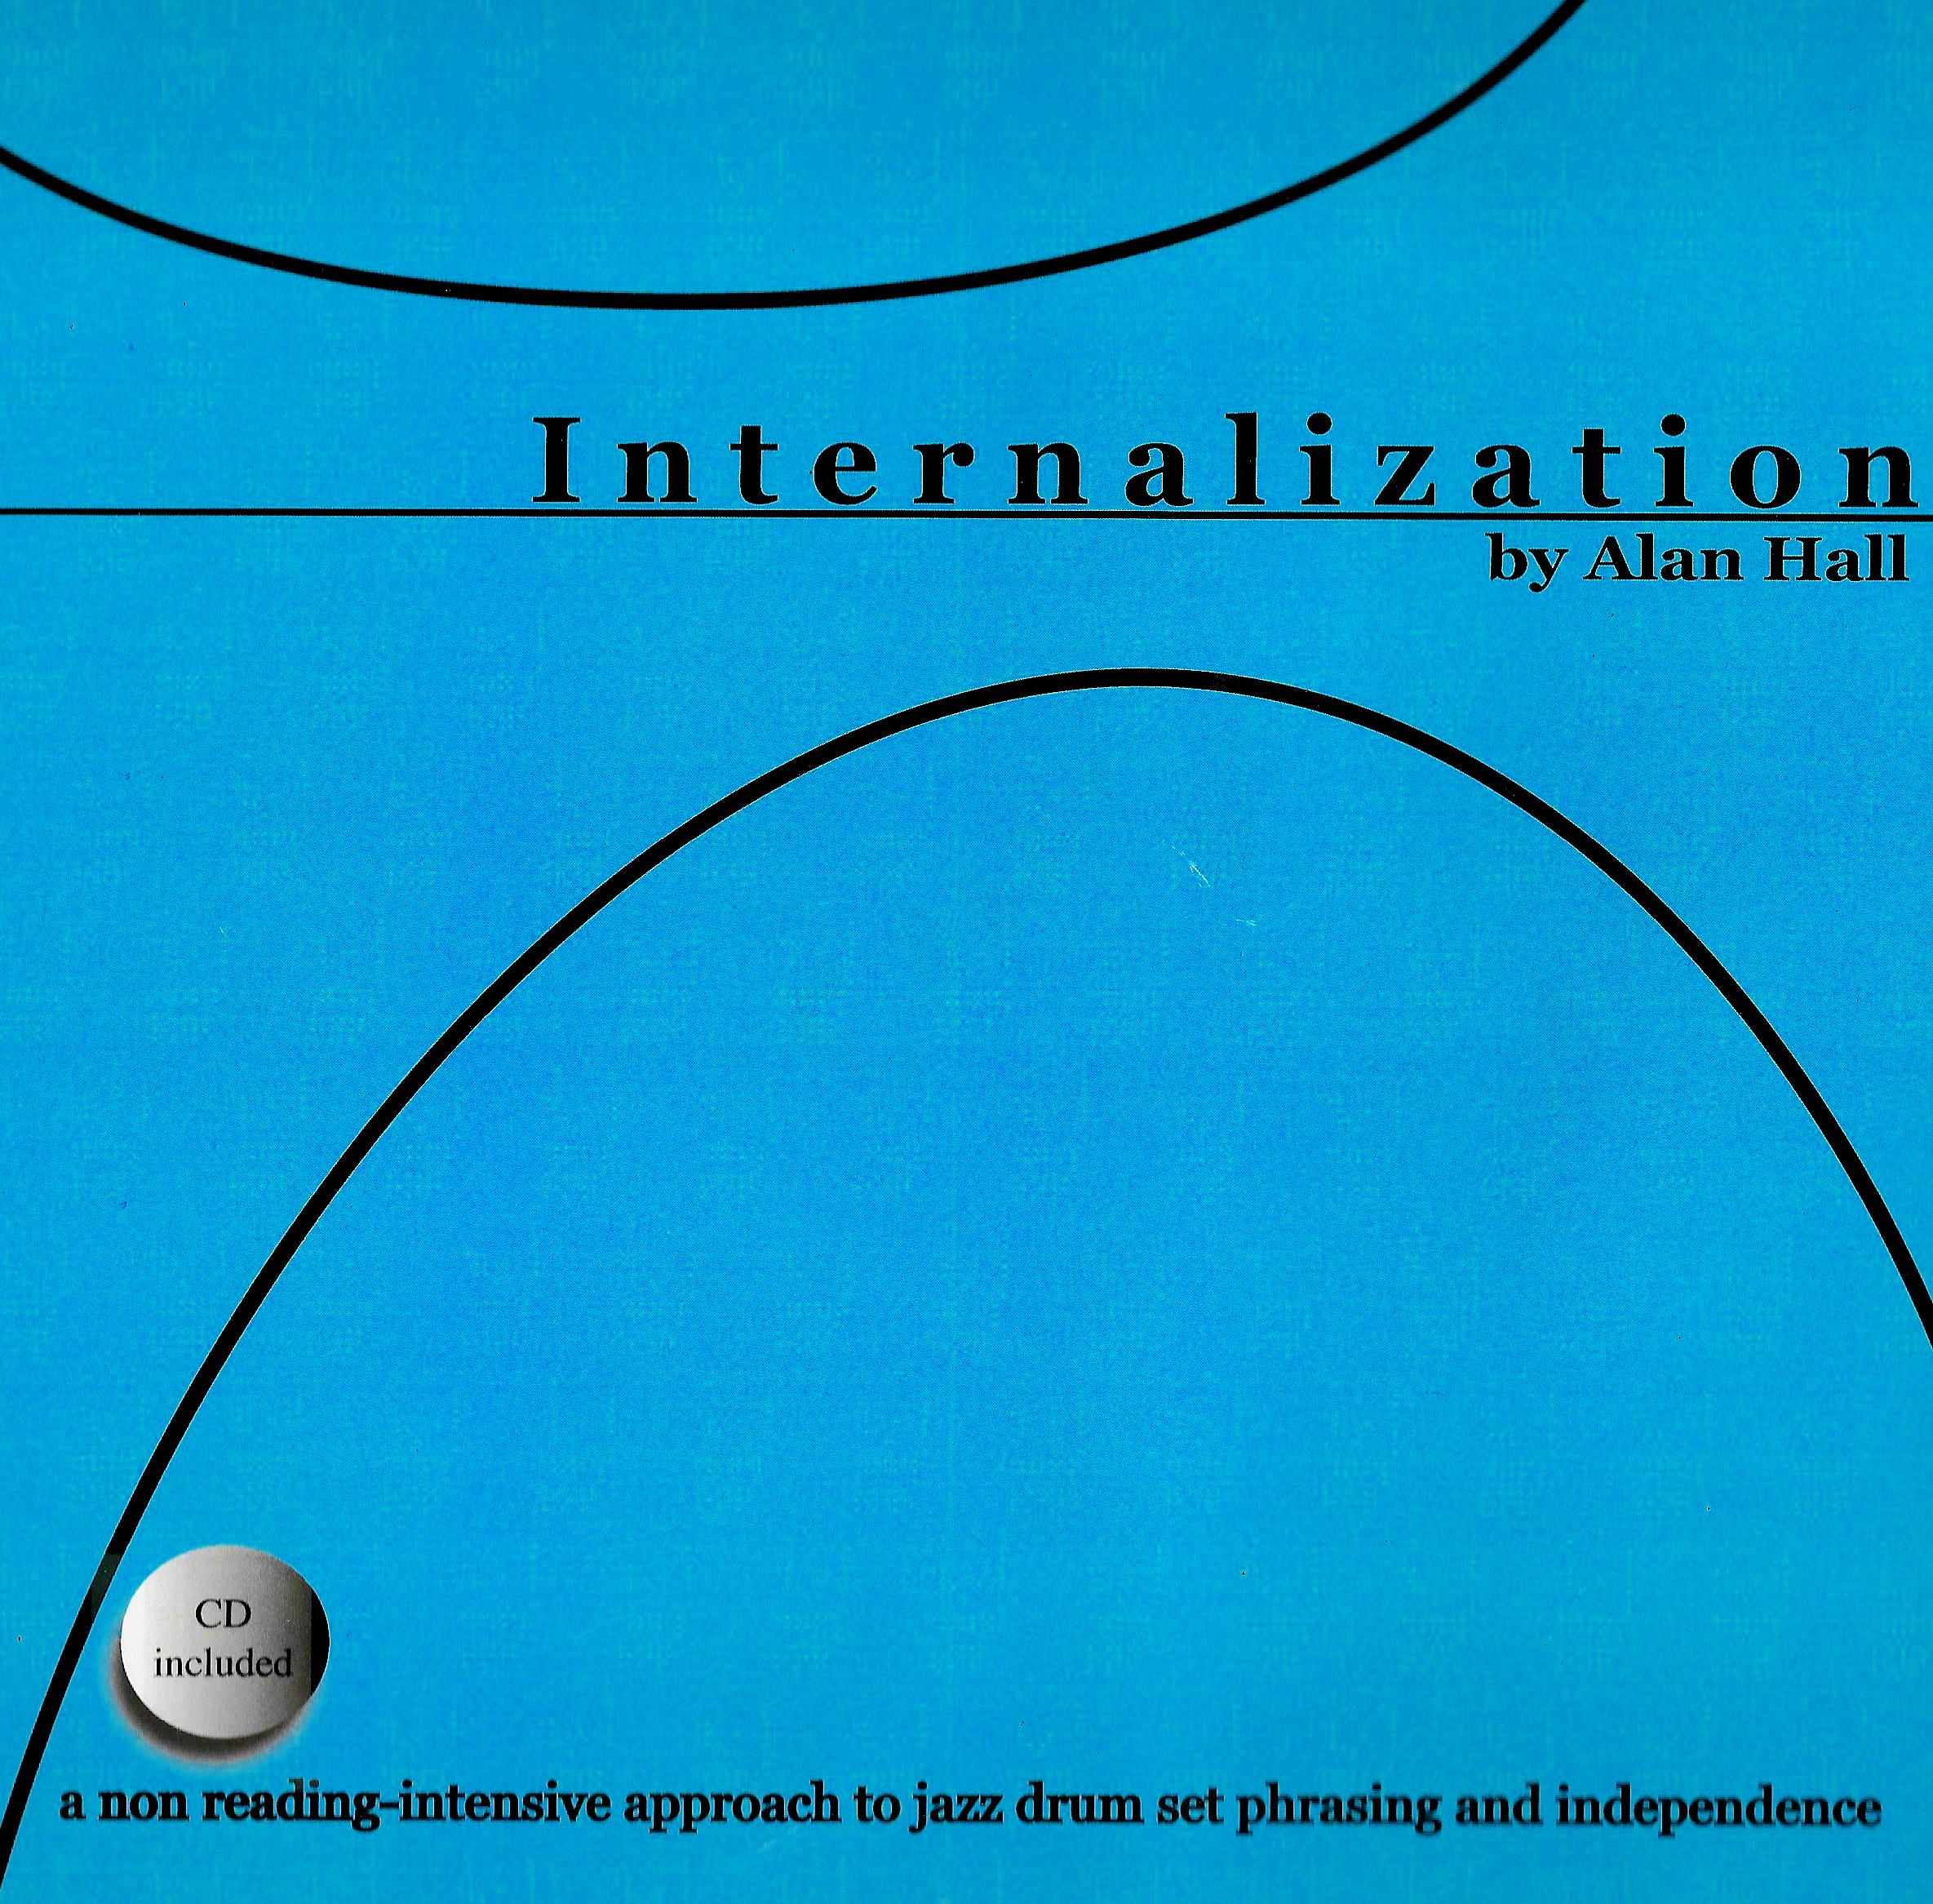 internalization+cover+shot.jpg